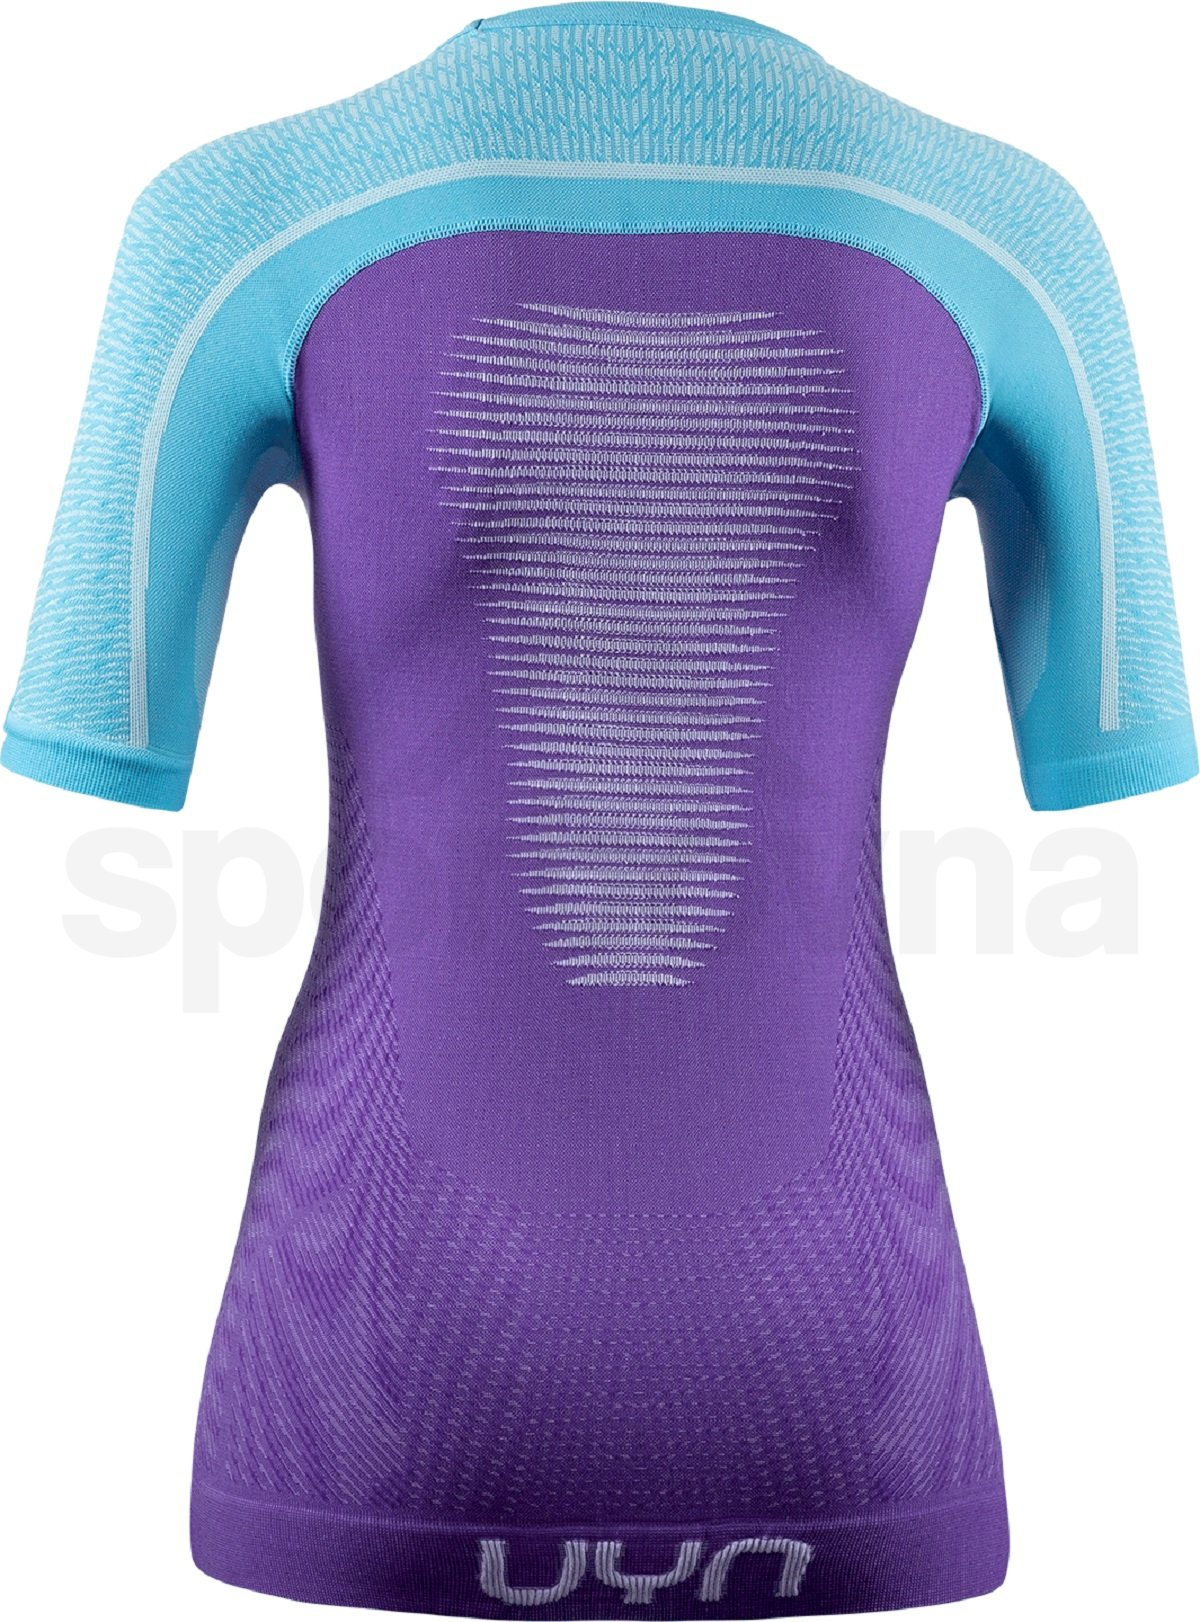 Funkční tričko UYN Marathon Ow Shirt Sh_Sl W - fialová/modrá/bílá